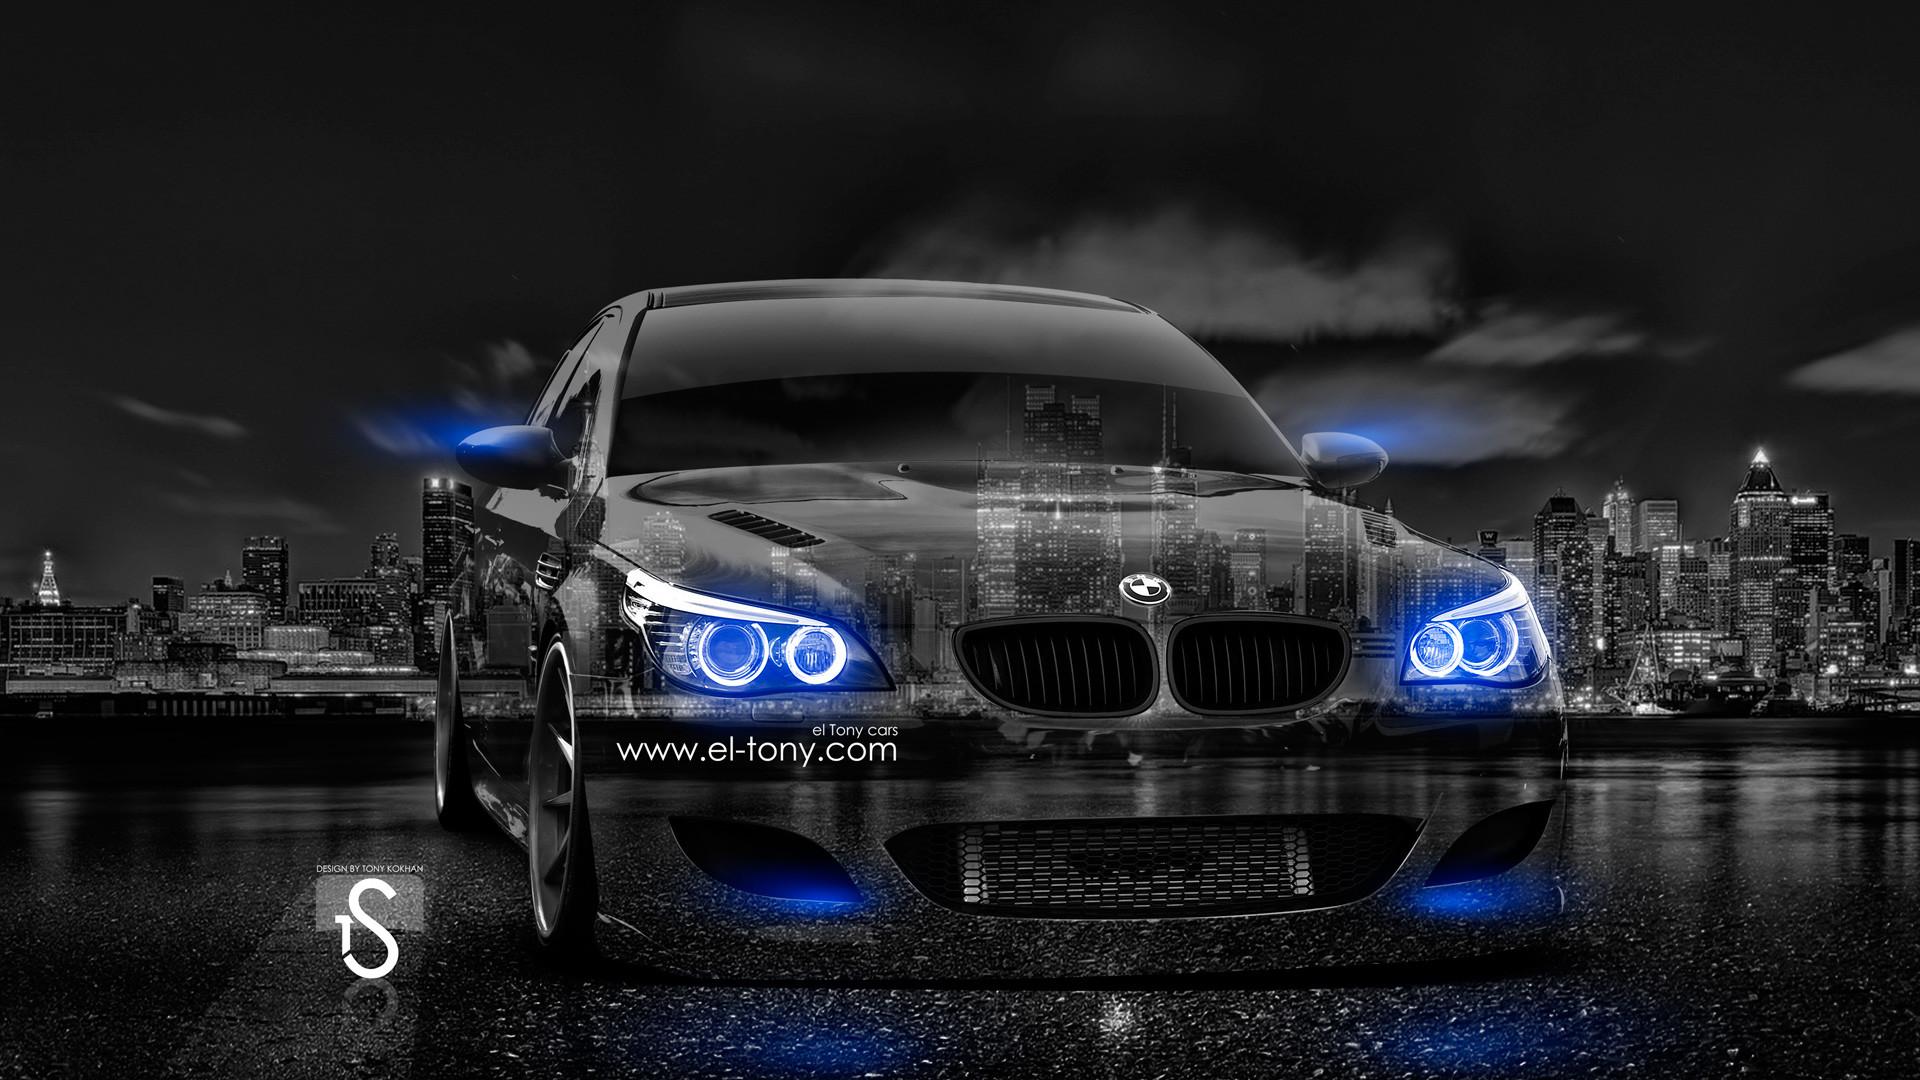 BMW M5 Wallpaper 76 images 1920x1080